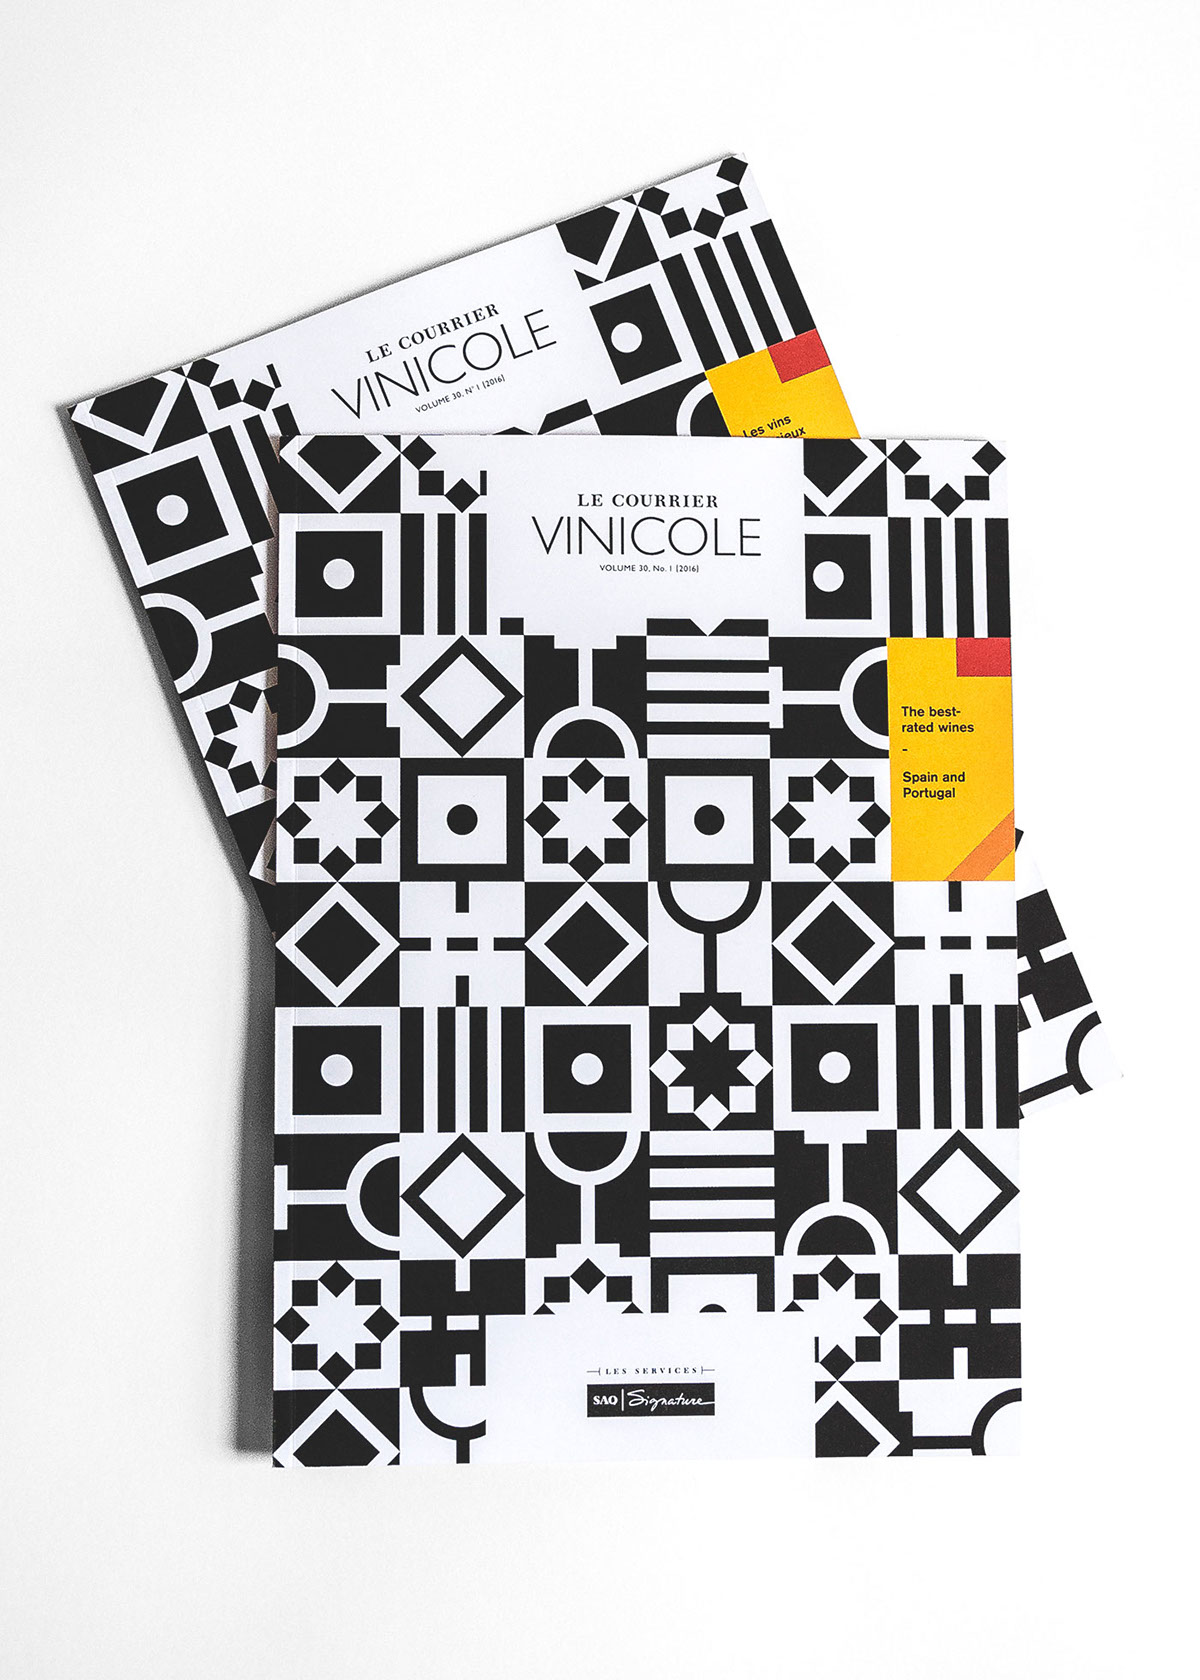 SAQ wine vin magazine print colors black and white mosaic mosaique espagne spain Portugal Sid Lee courrier Vinicole